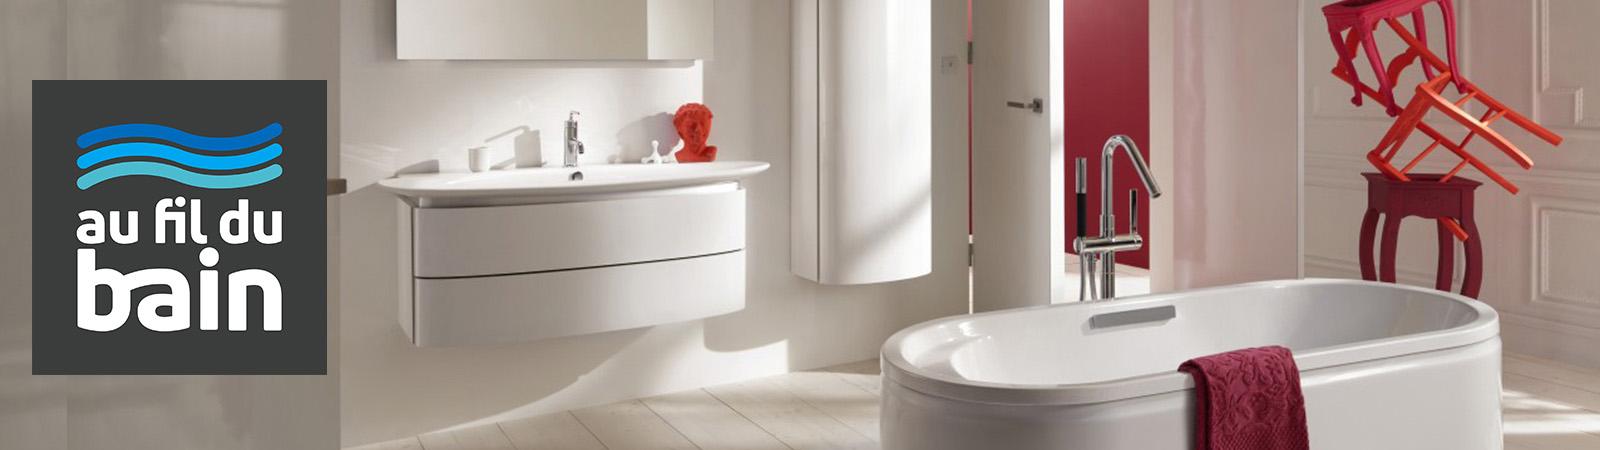 Climair - Pons - Salle de bain